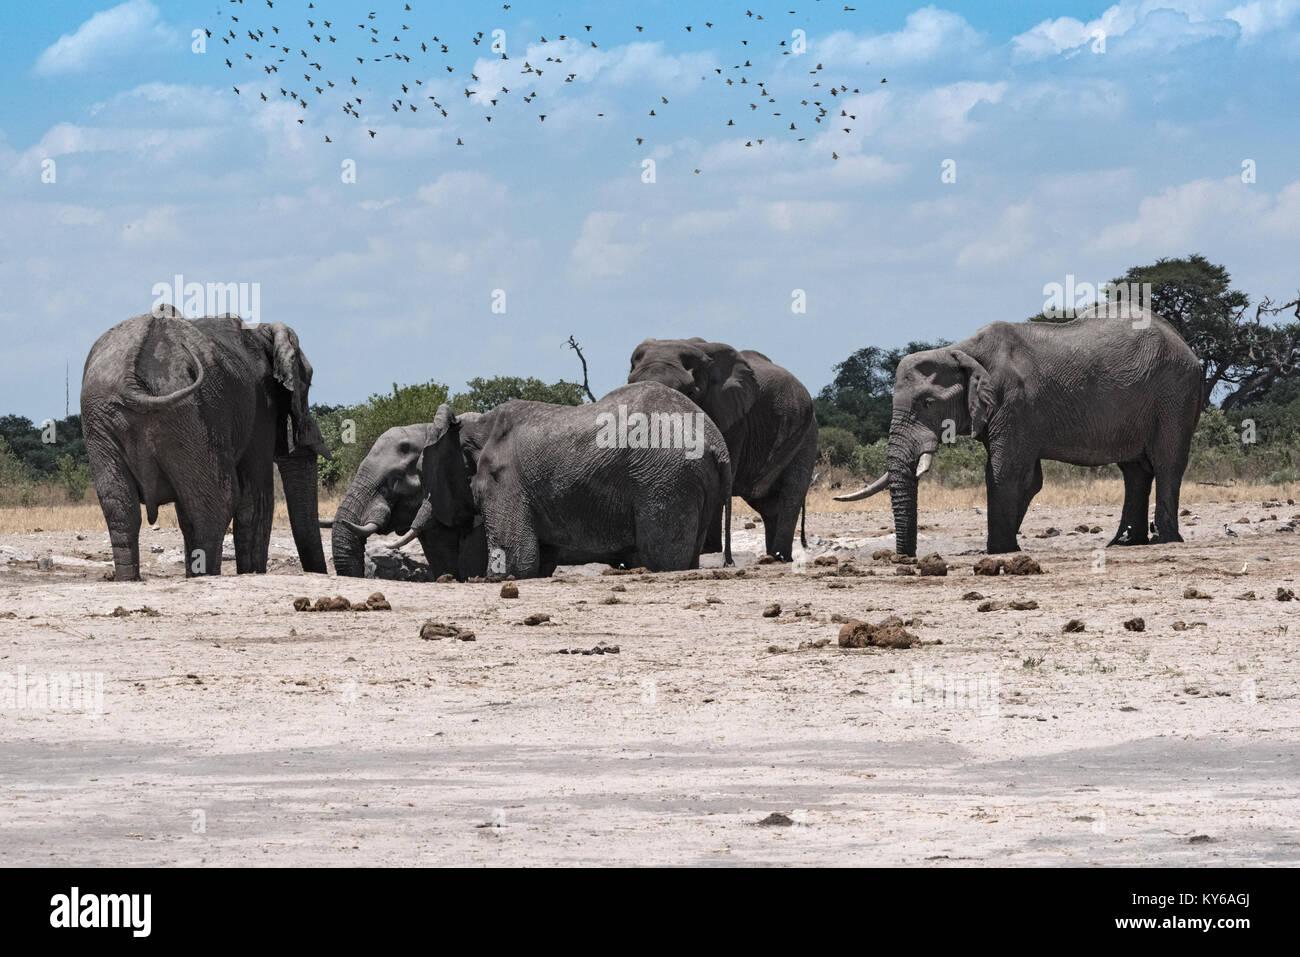 Gruppo di elefanti a waterhole Chope nel Parco Nazionale del Botswana Immagini Stock